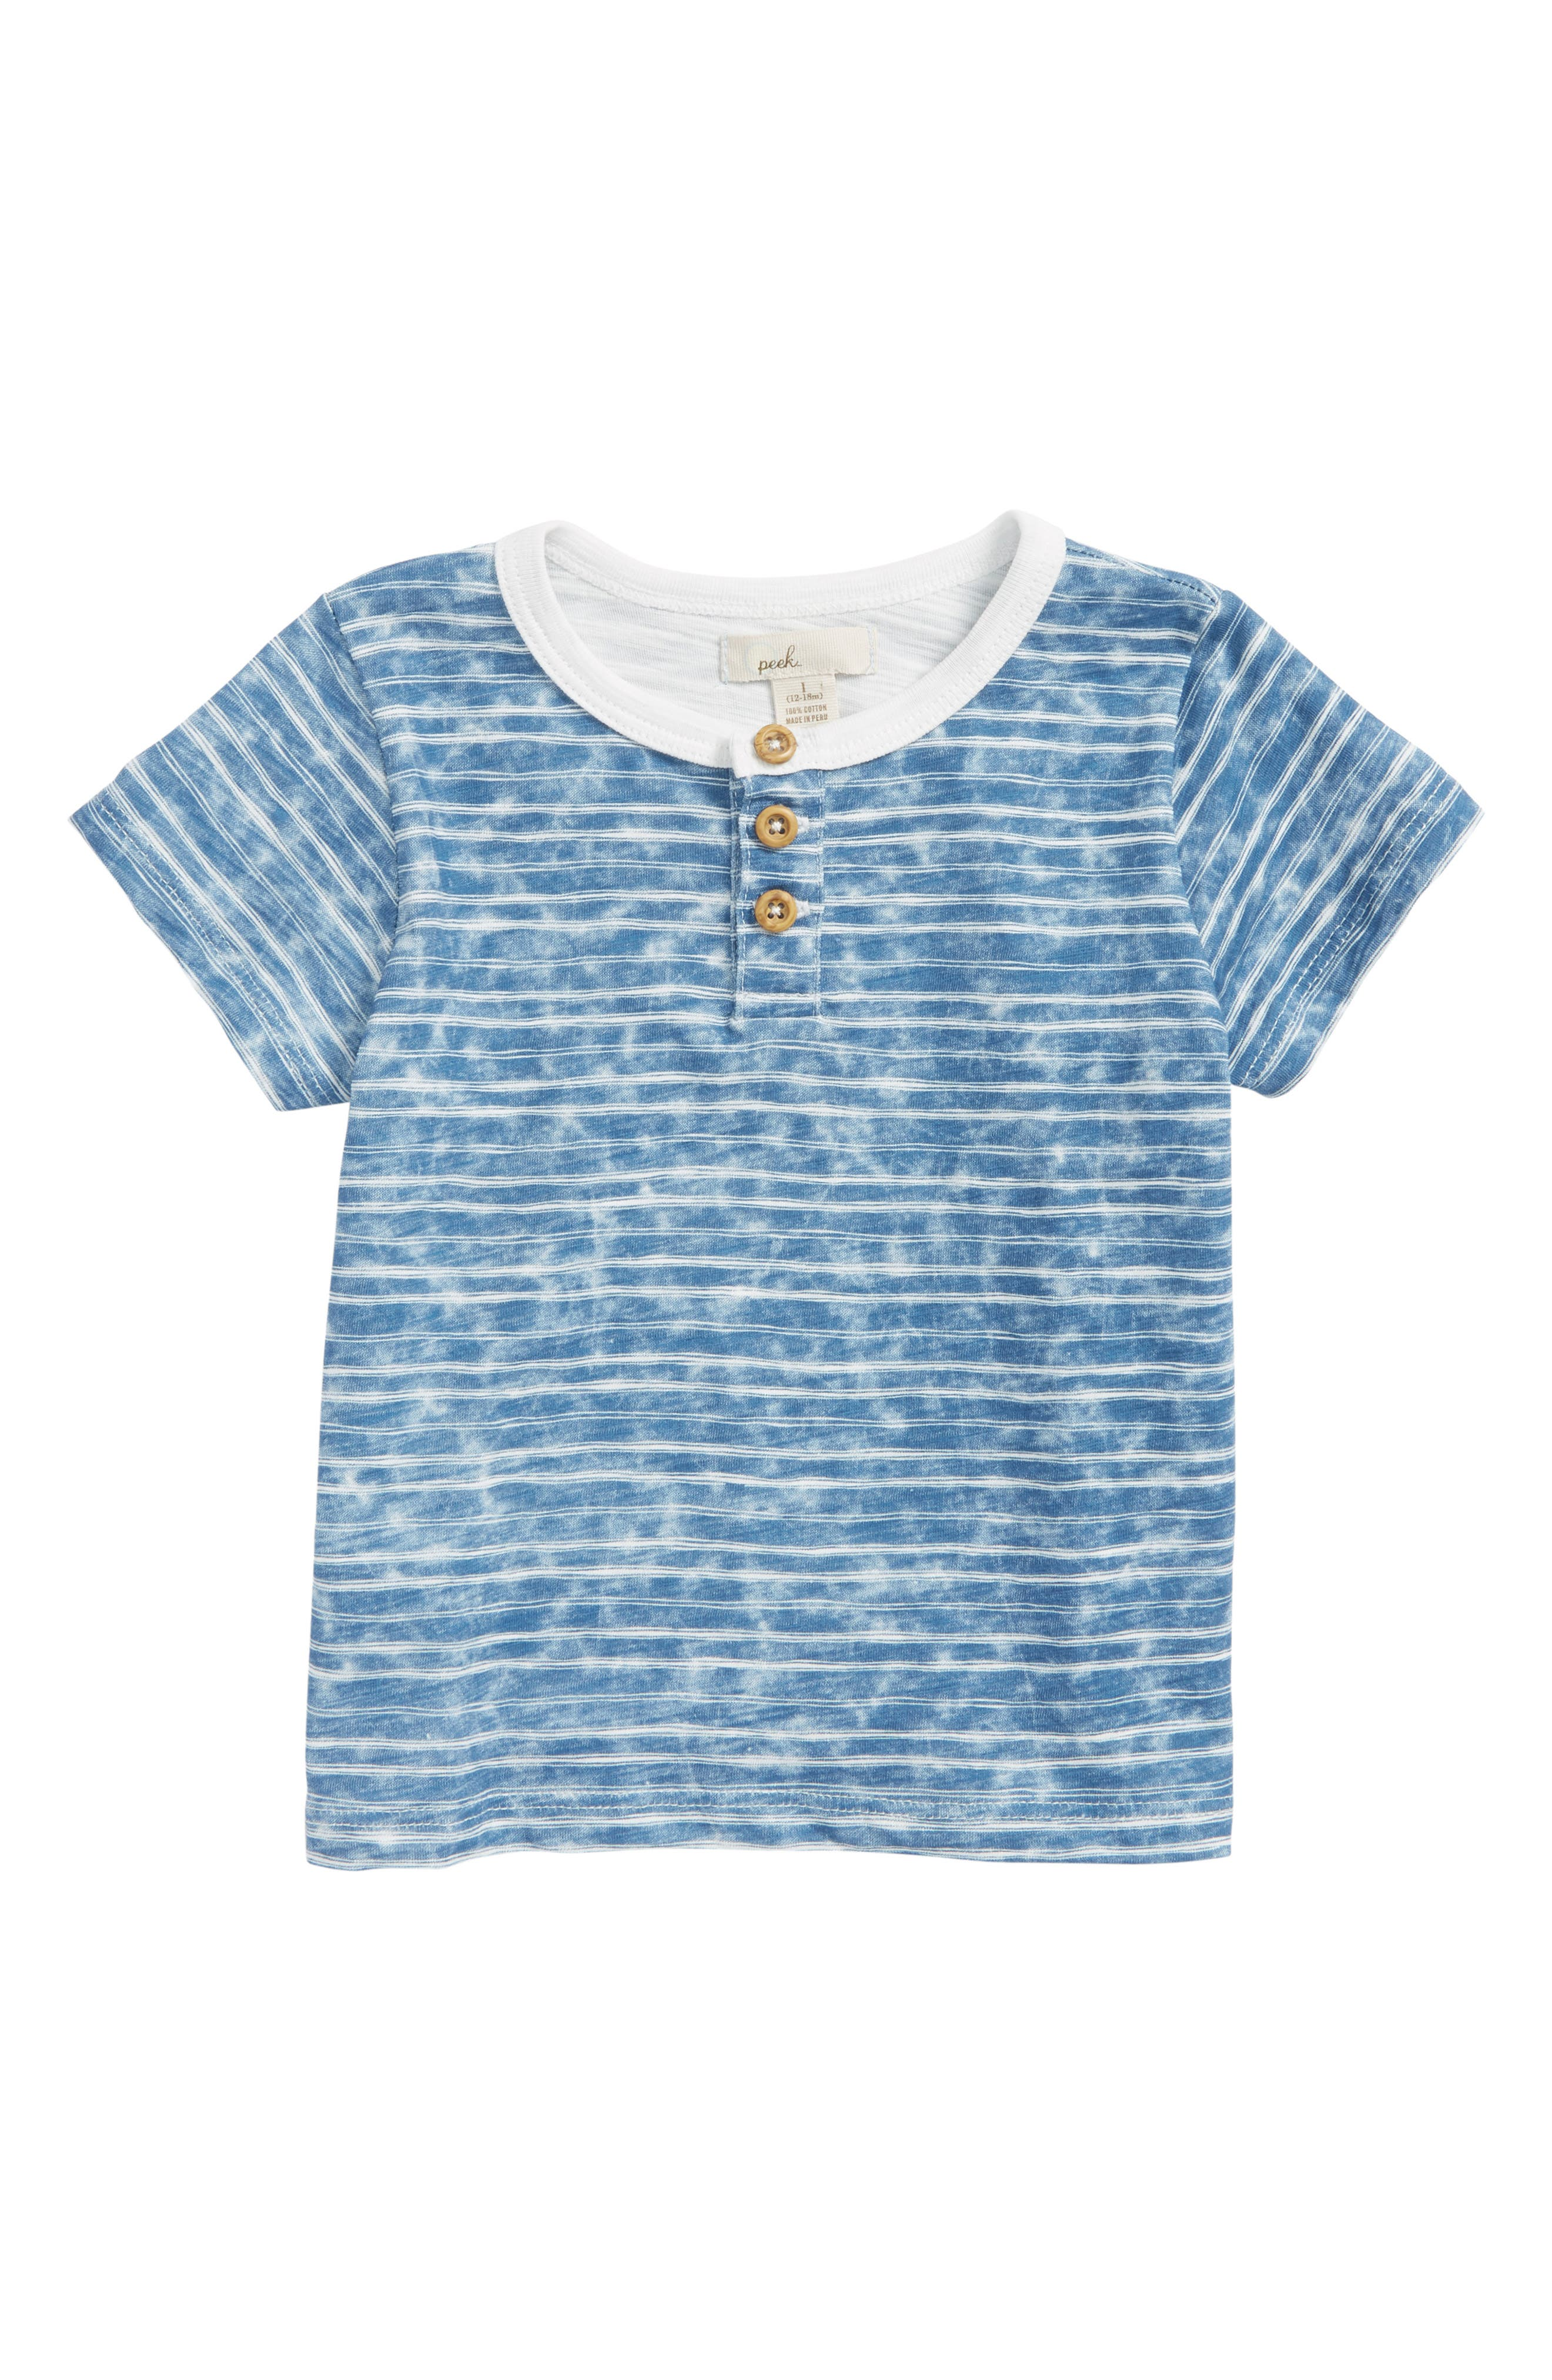 Peek Brandon T-Shirt (Baby Boys)